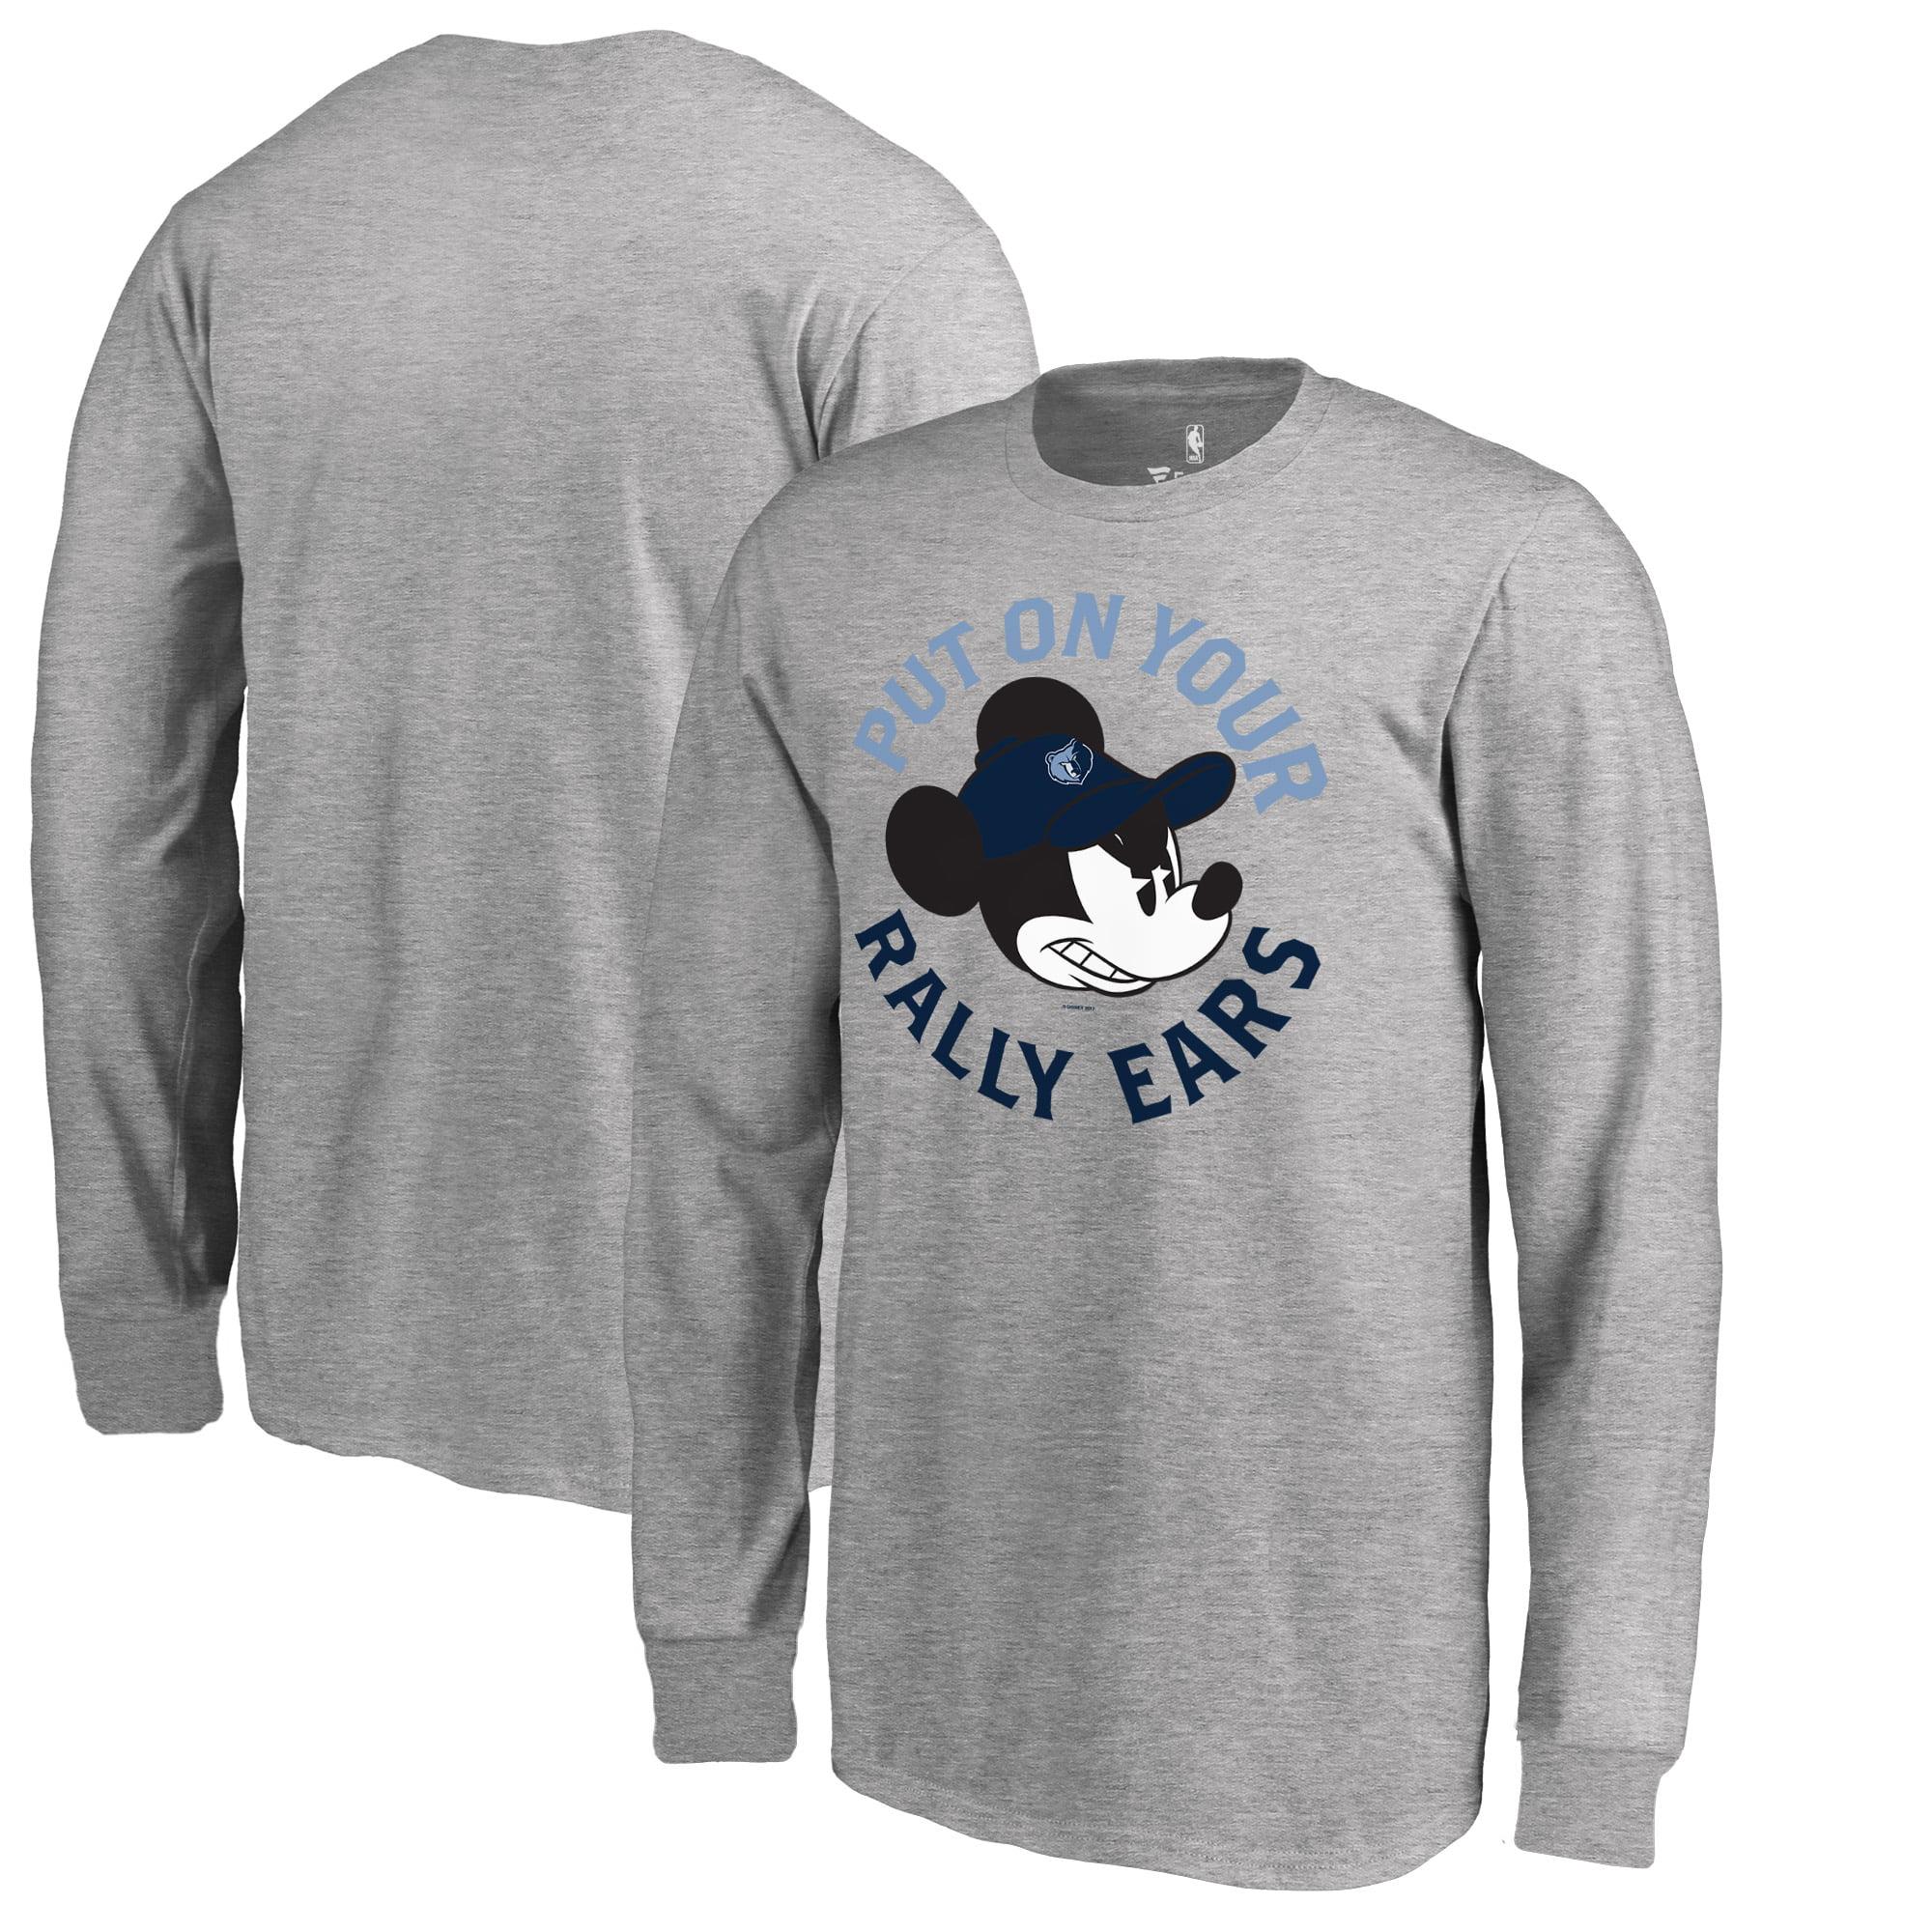 Memphis Grizzlies Fanatics Branded Youth Disney Rally Ears Long Sleeve T-Shirt - Ash